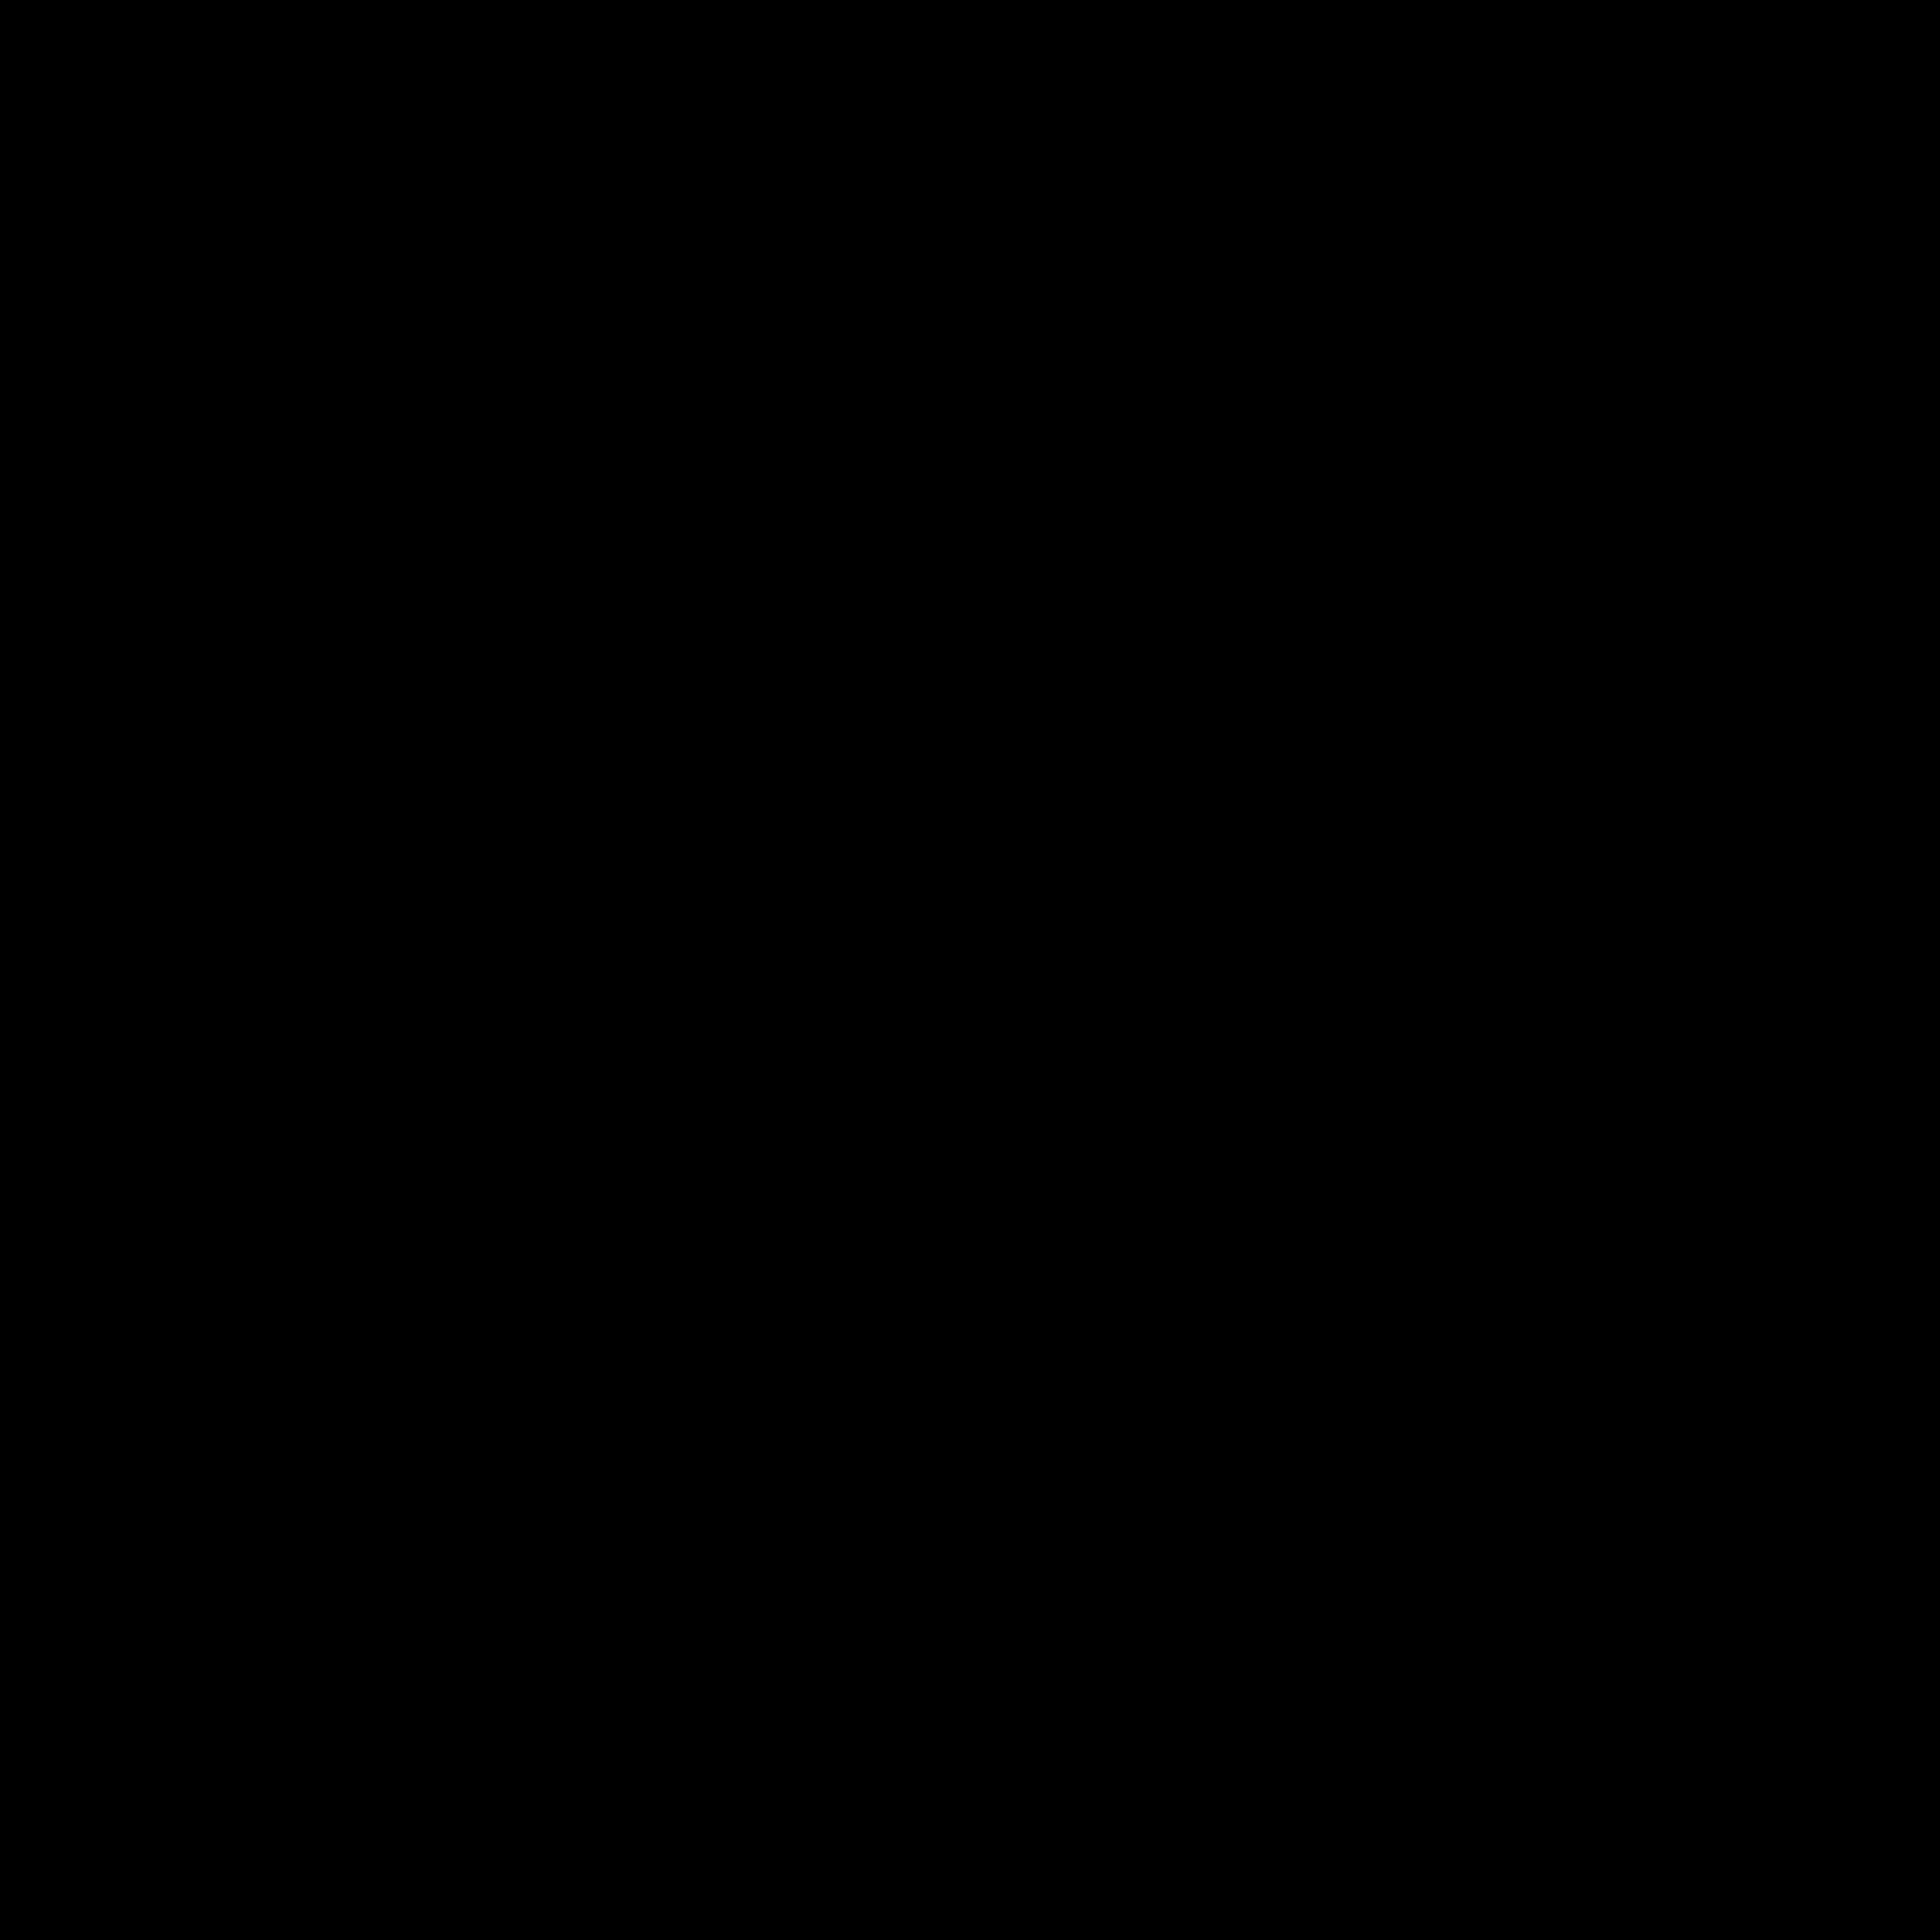 abc-broadcast-logo-png-transparent (1) 2.png